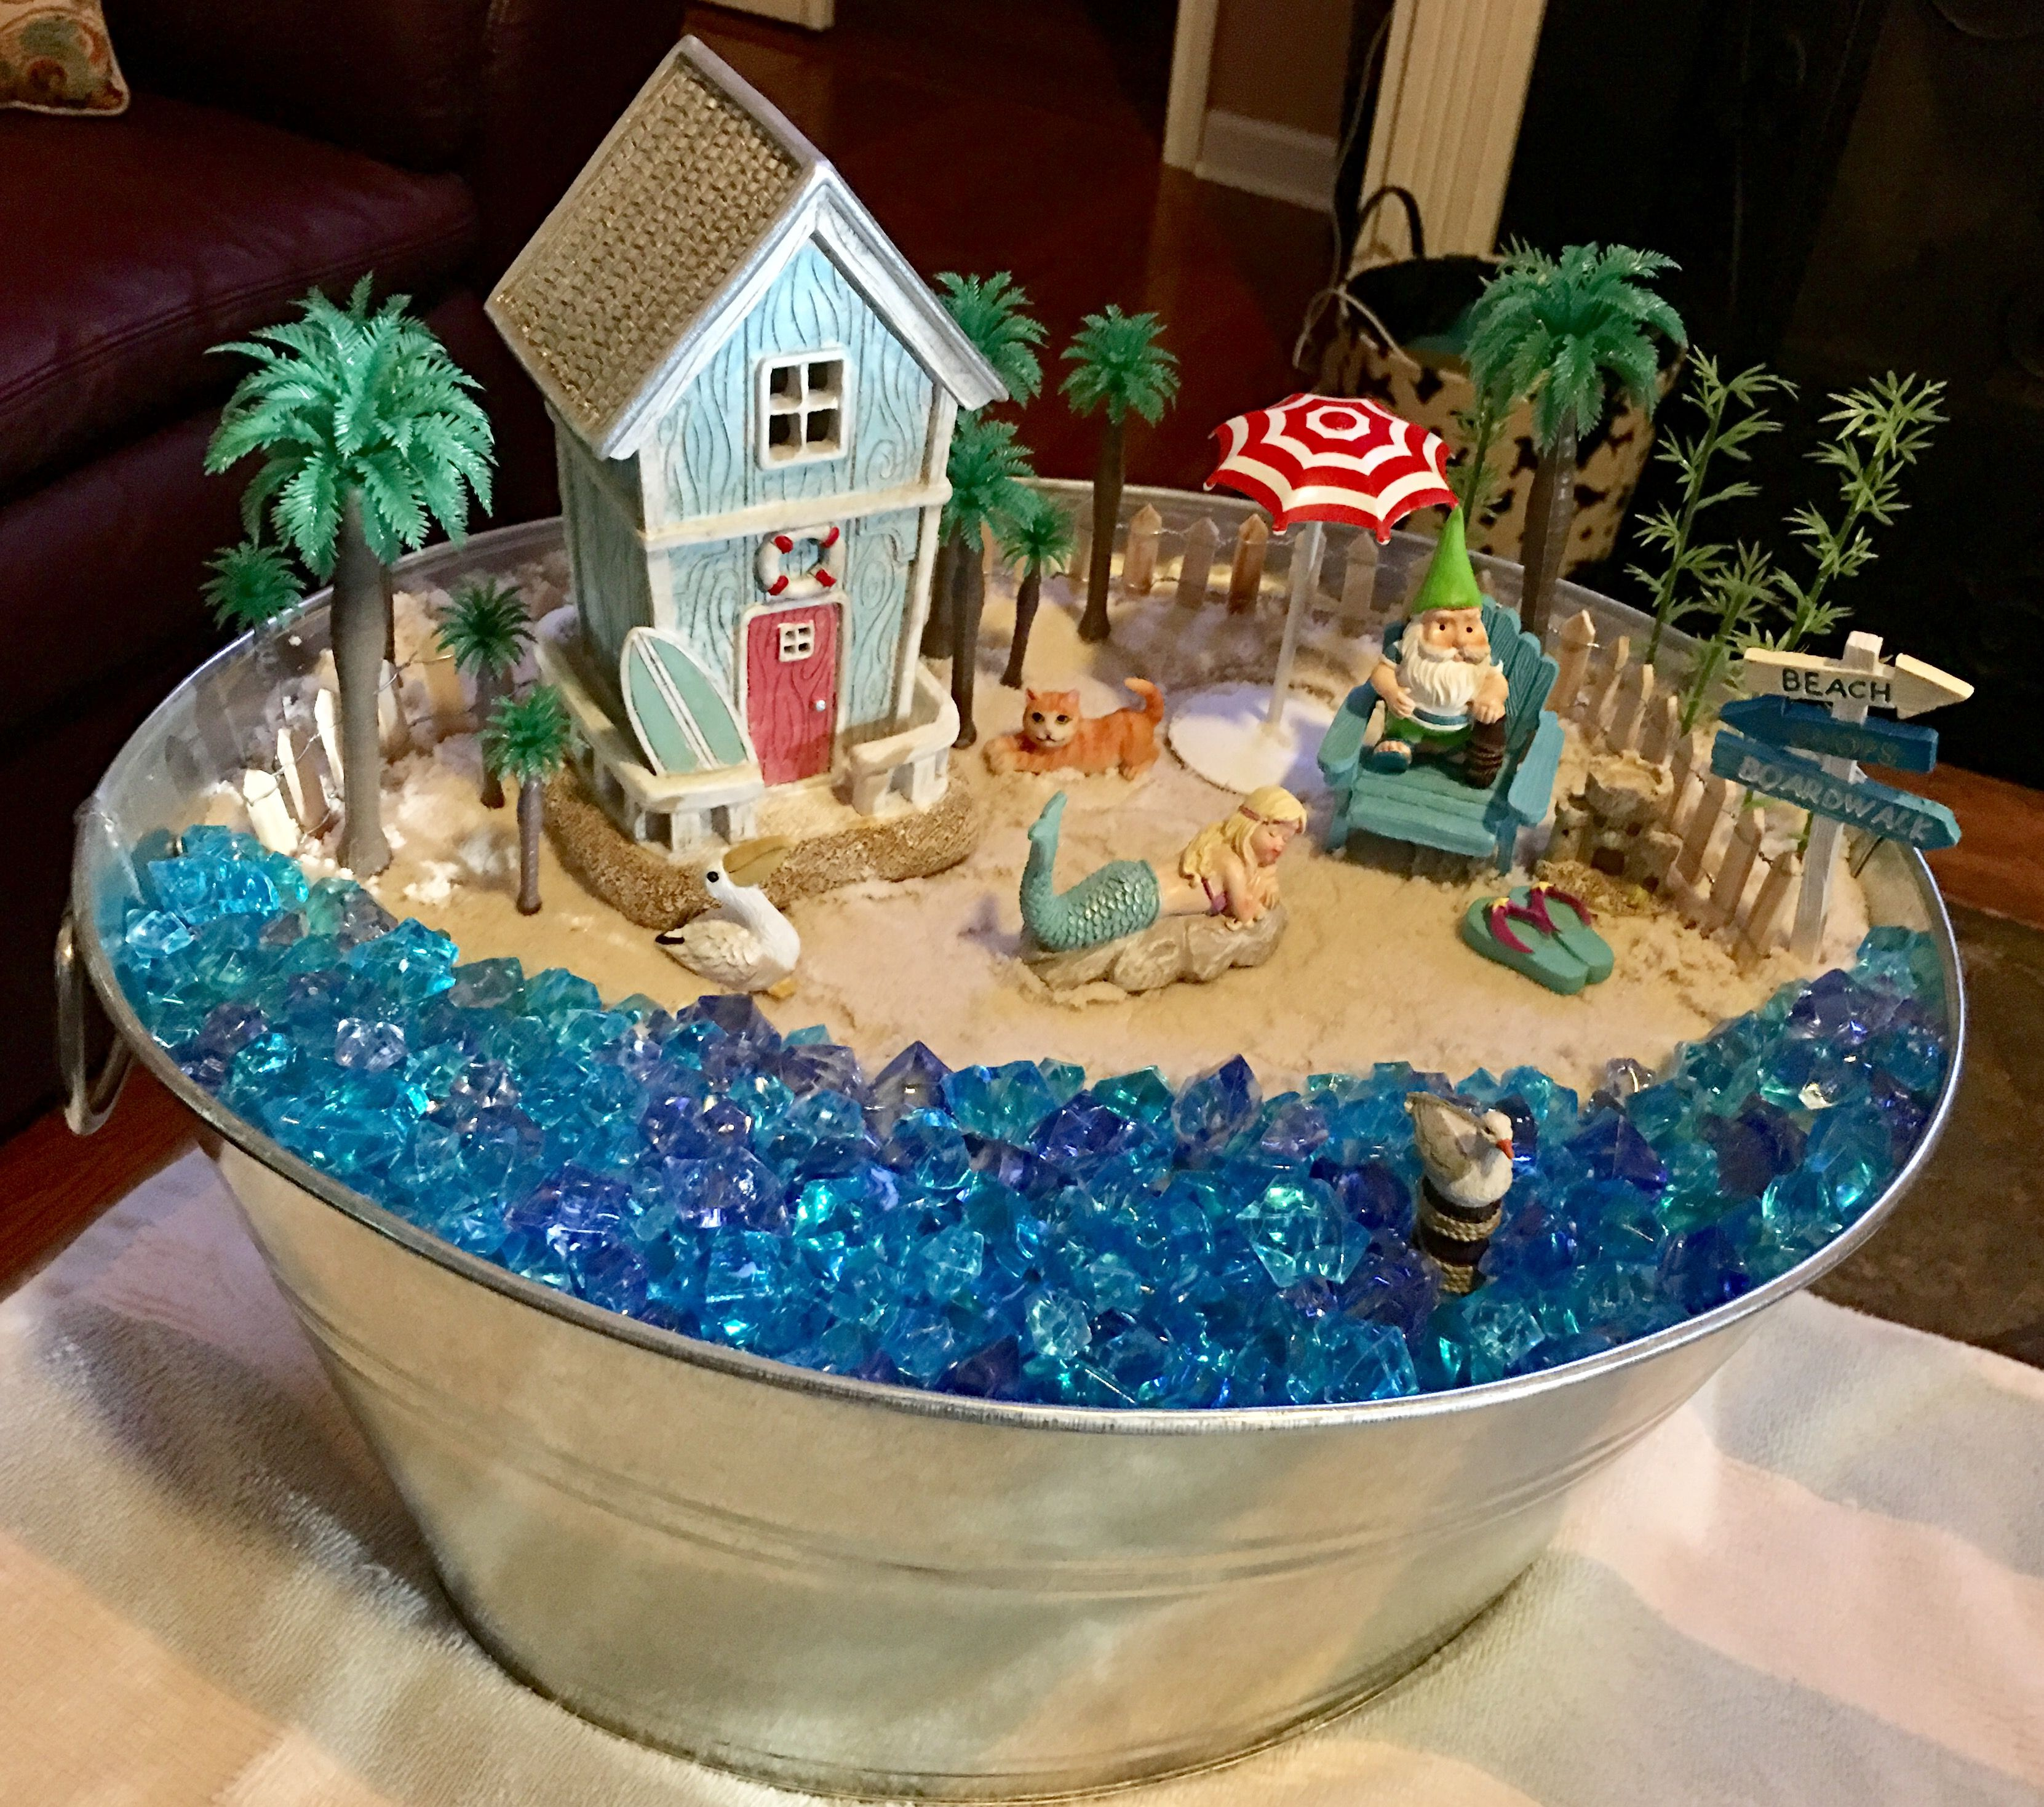 Mini Blue Nautical Lake House w Opening Doors ~ Beach Fairy Garden or Terrarium Supply ~ Coastal Home /& Wedding Accents Garden